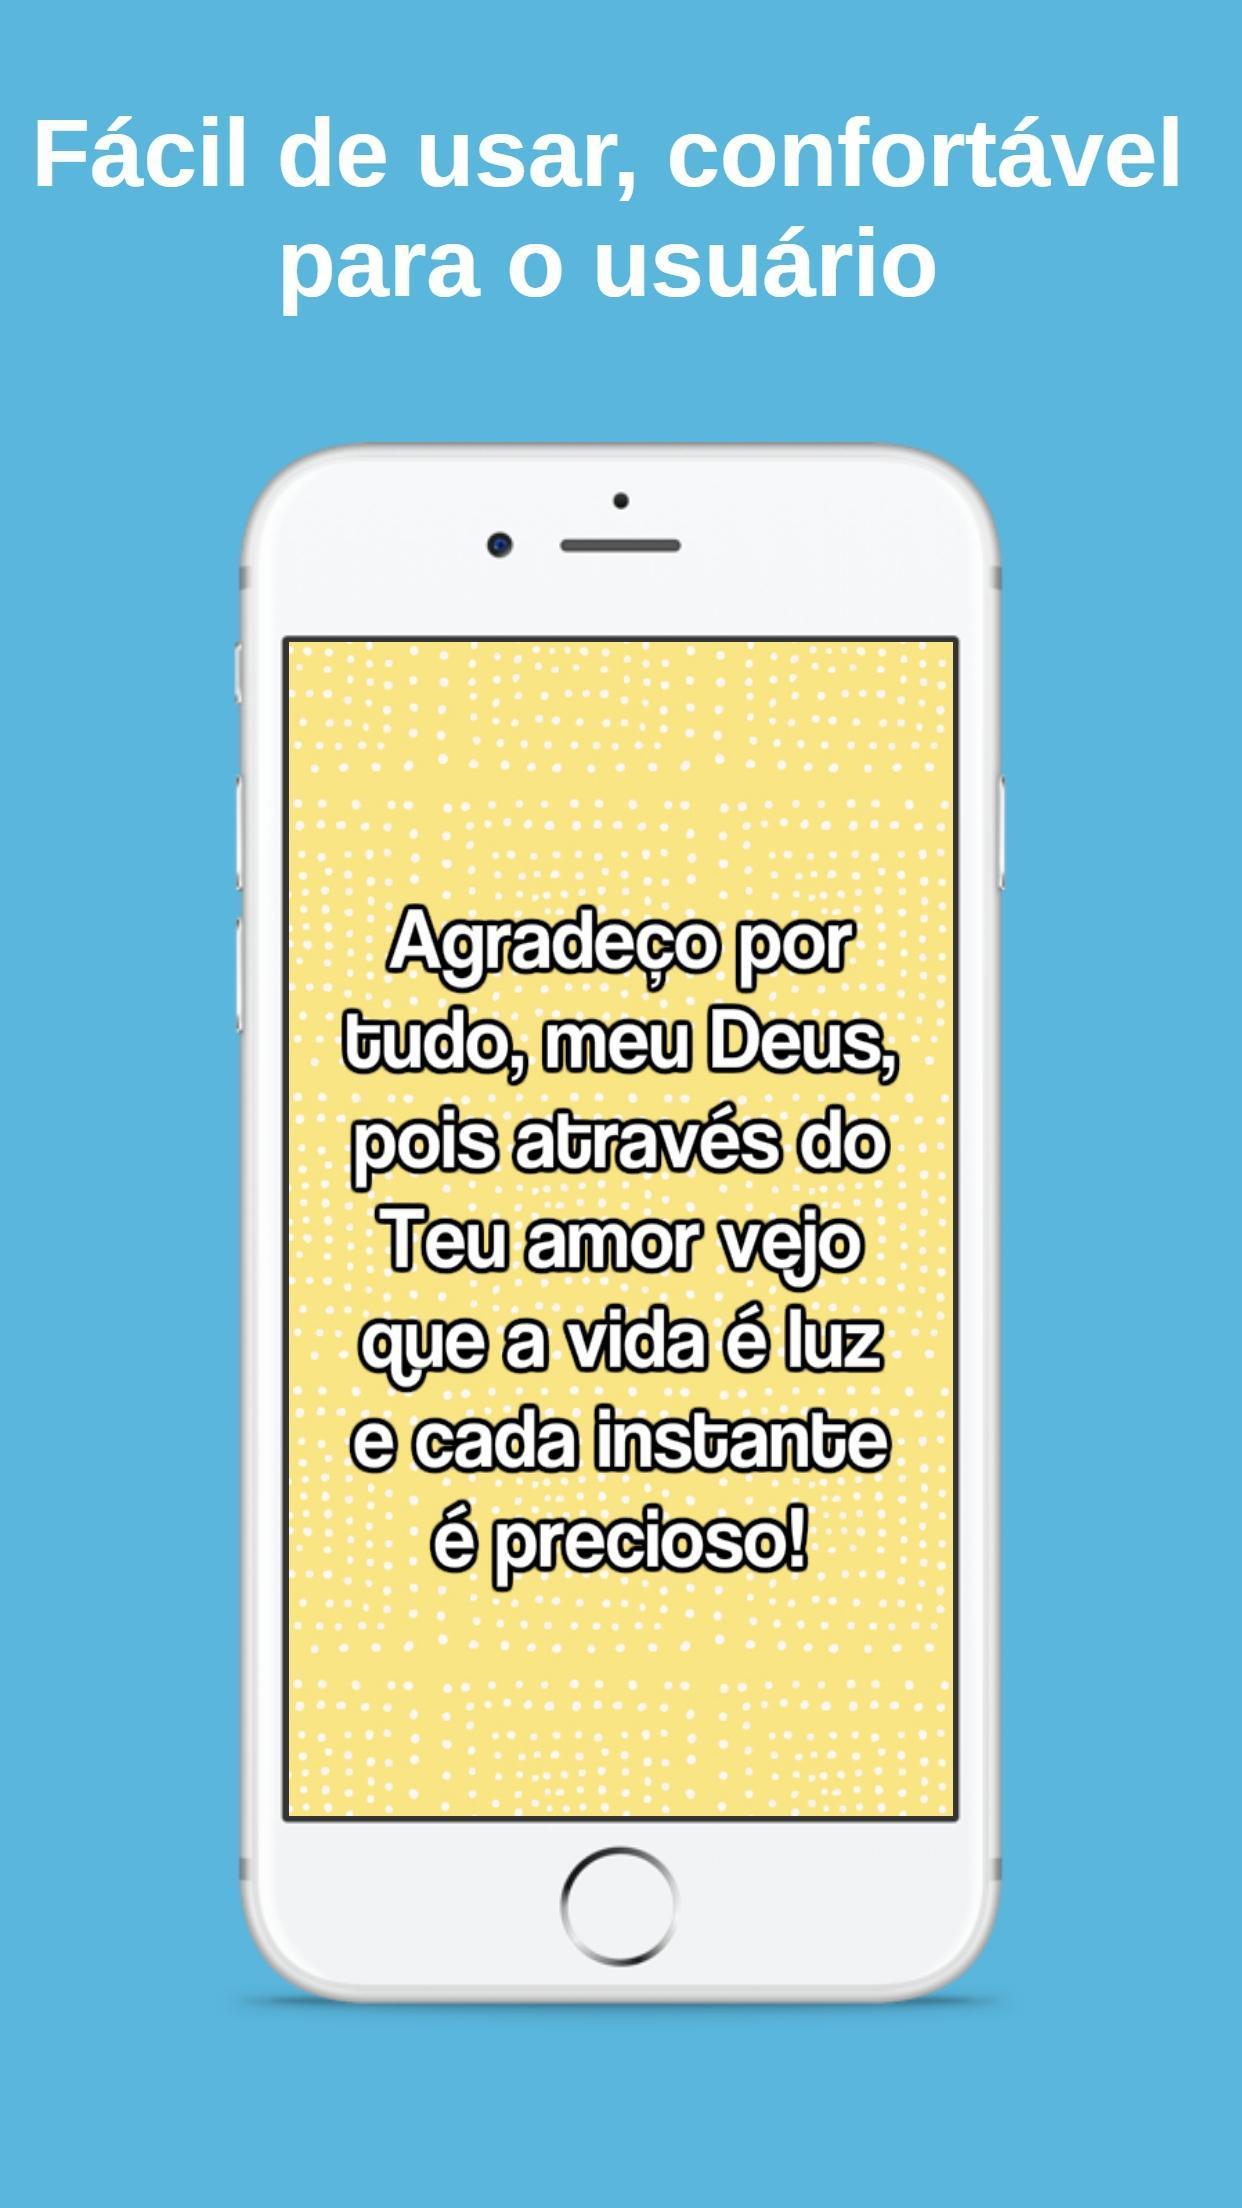 Frases De Agradecimento A Deus For Android Apk Download